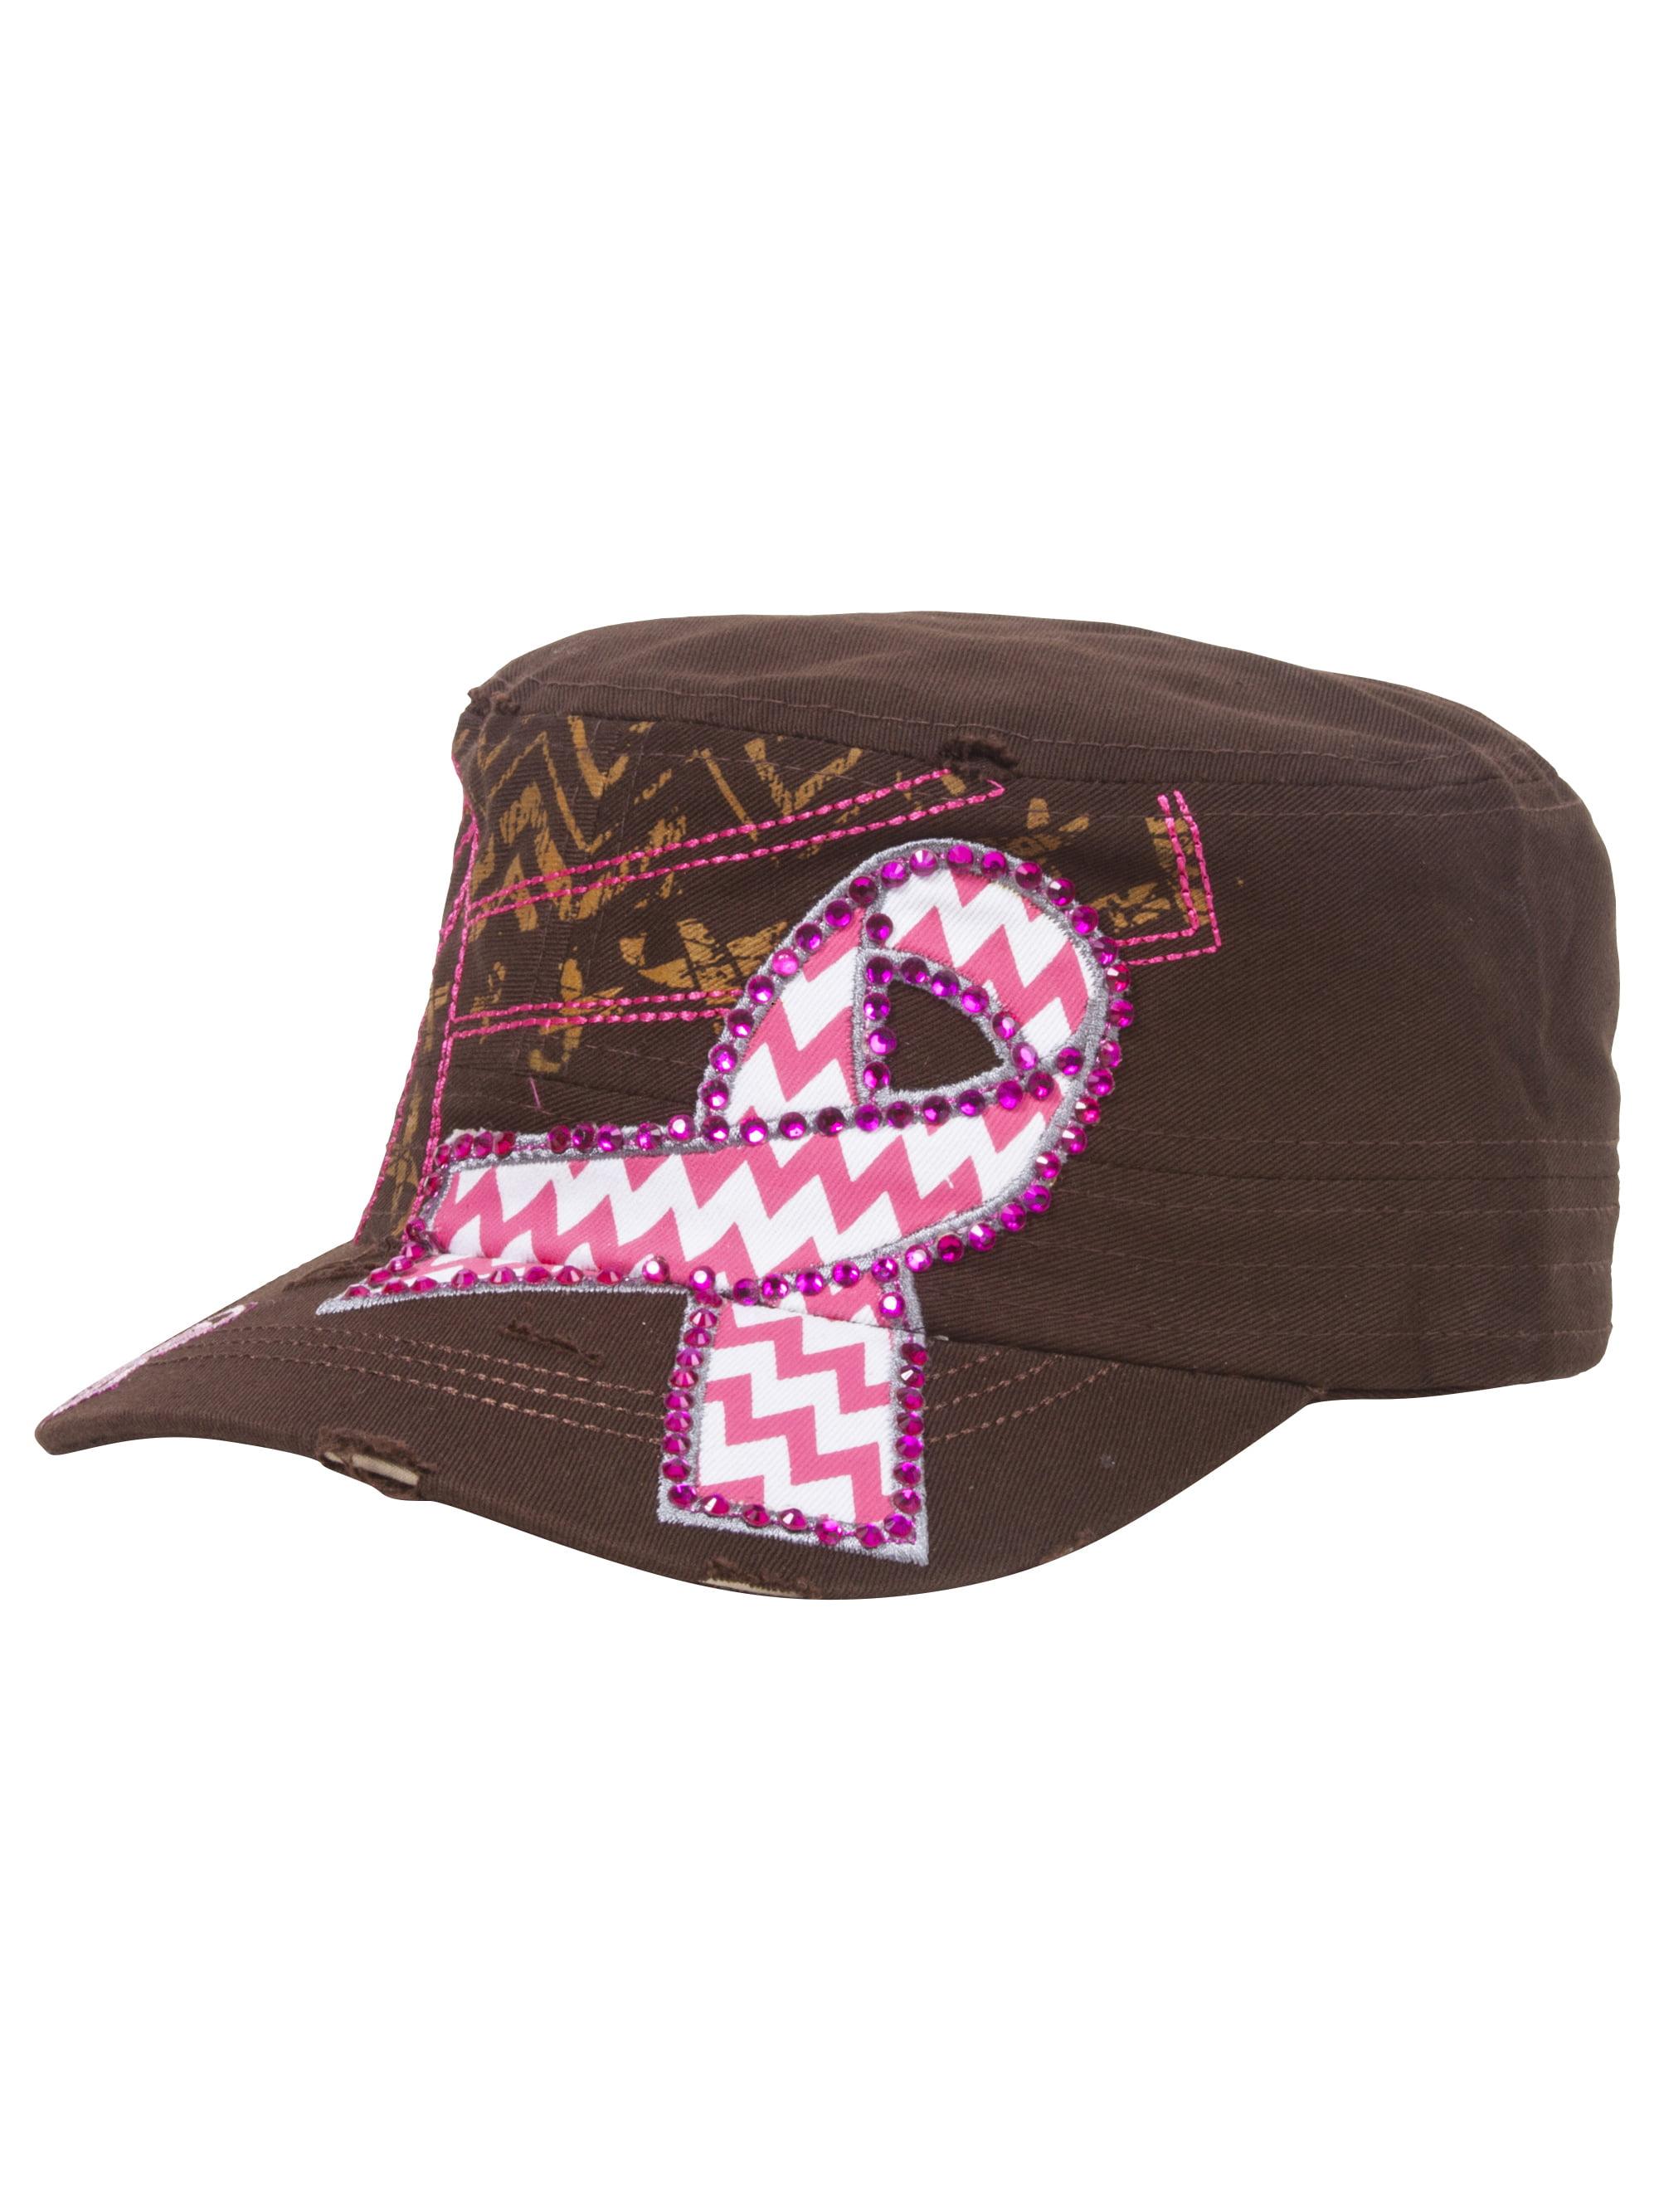 Top Headwear Pink Chevron Ribbon Distressed Cadet Cap - Camo 619d8aacc31